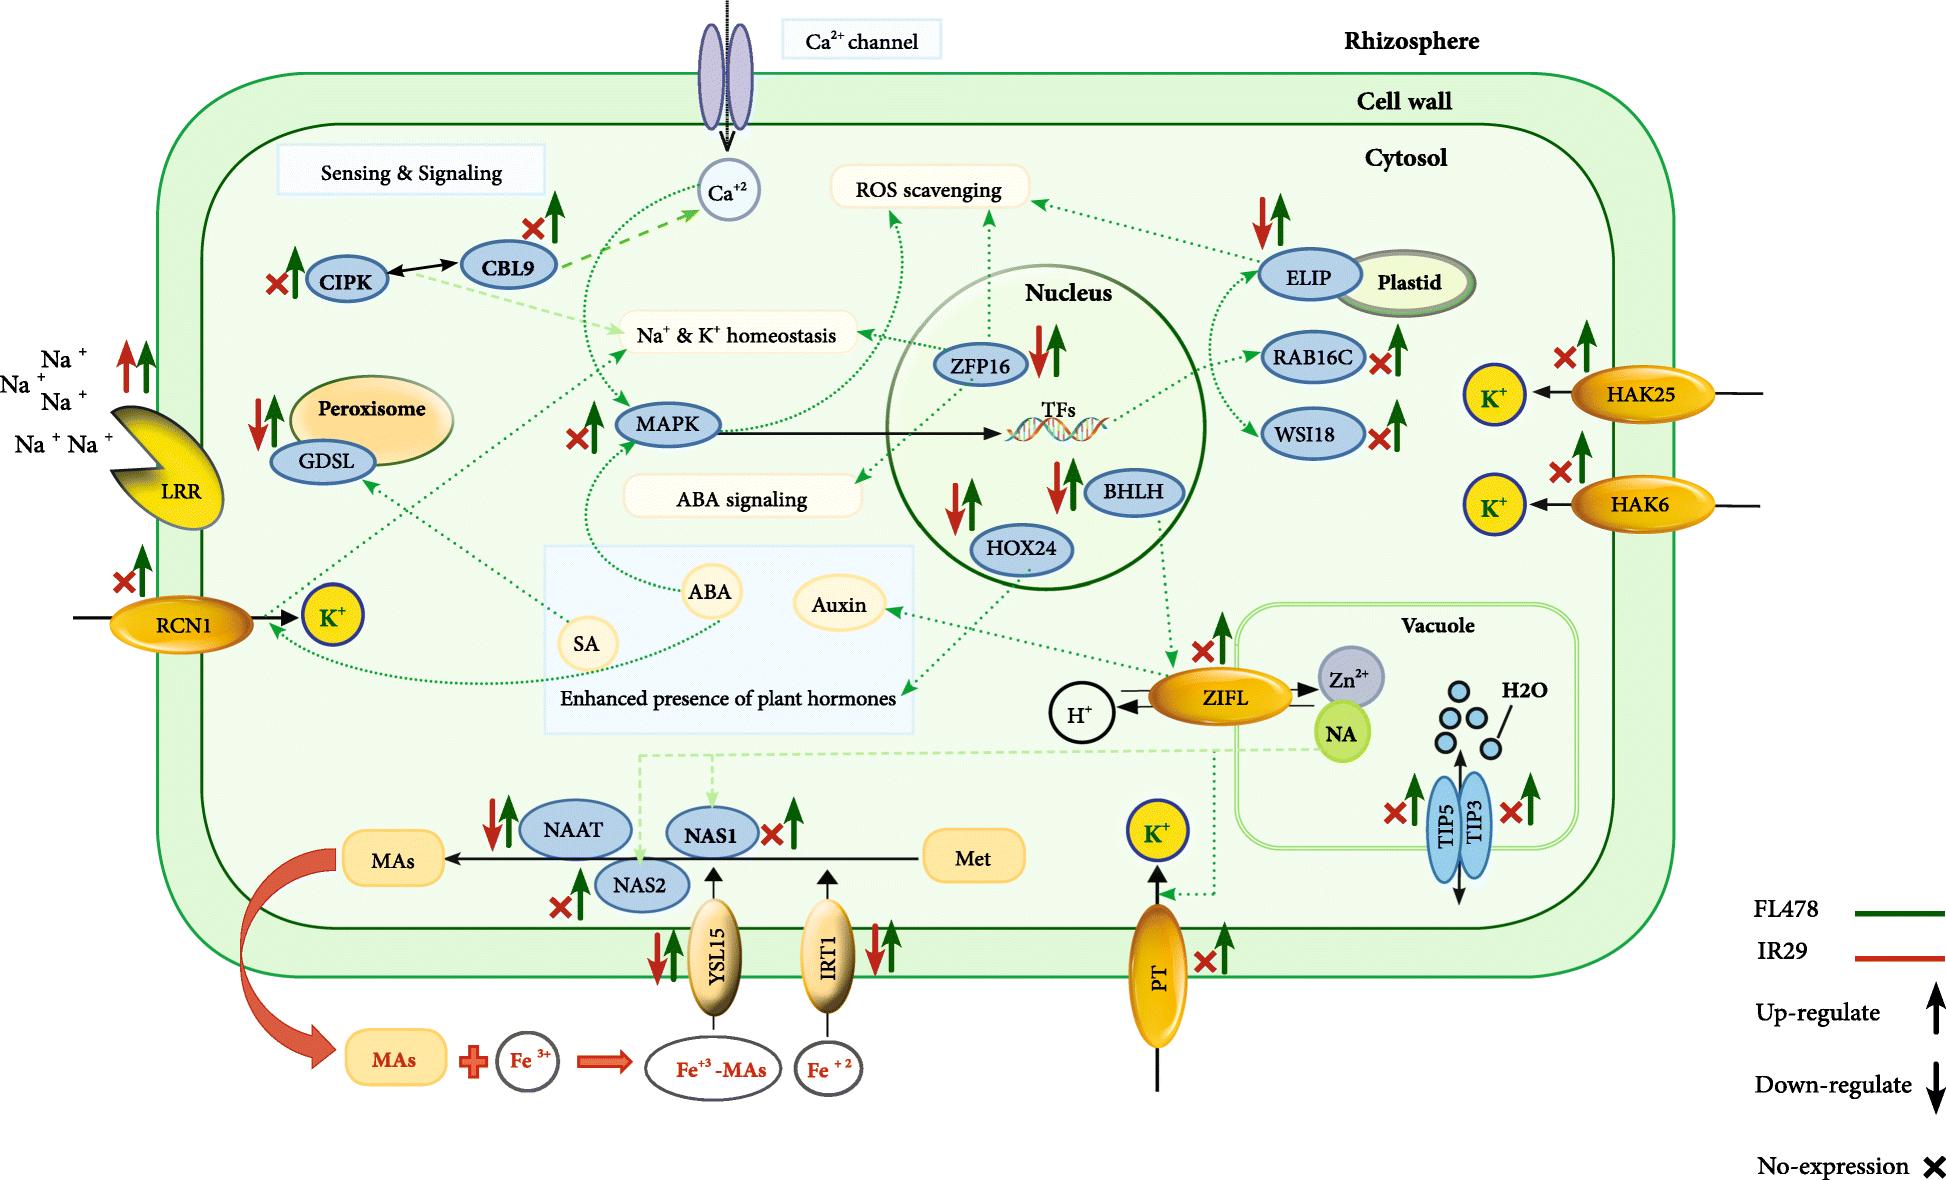 Dissecting molecular mechanisms underlying salt tolerance in